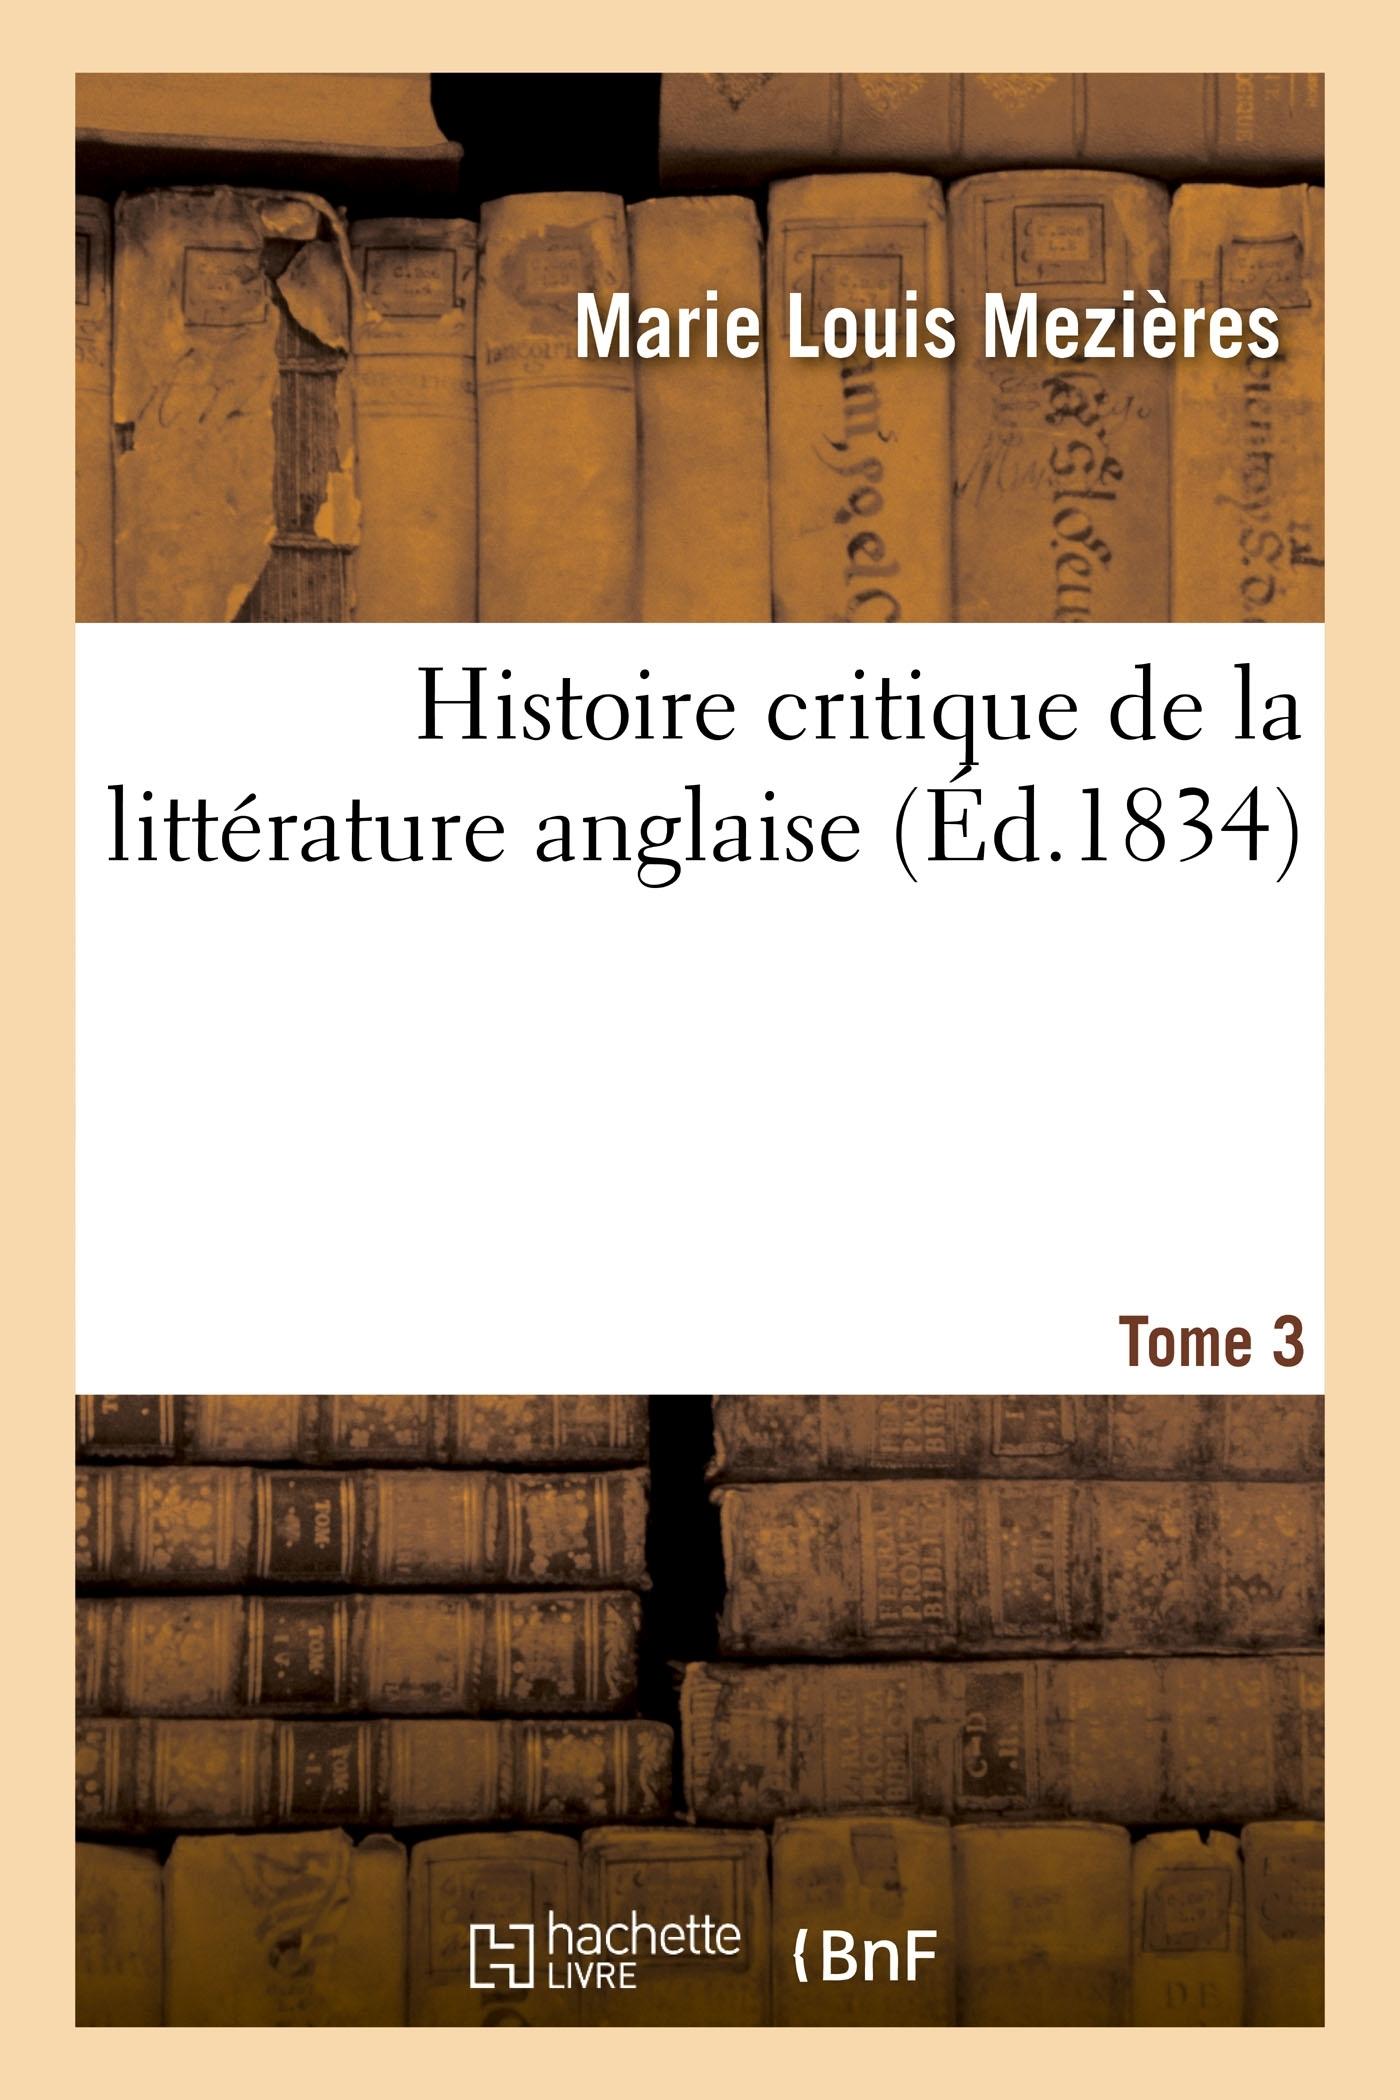 HISTOIRE CRITIQUE DE LA LITTERATURE ANGLAISE. TOME 3